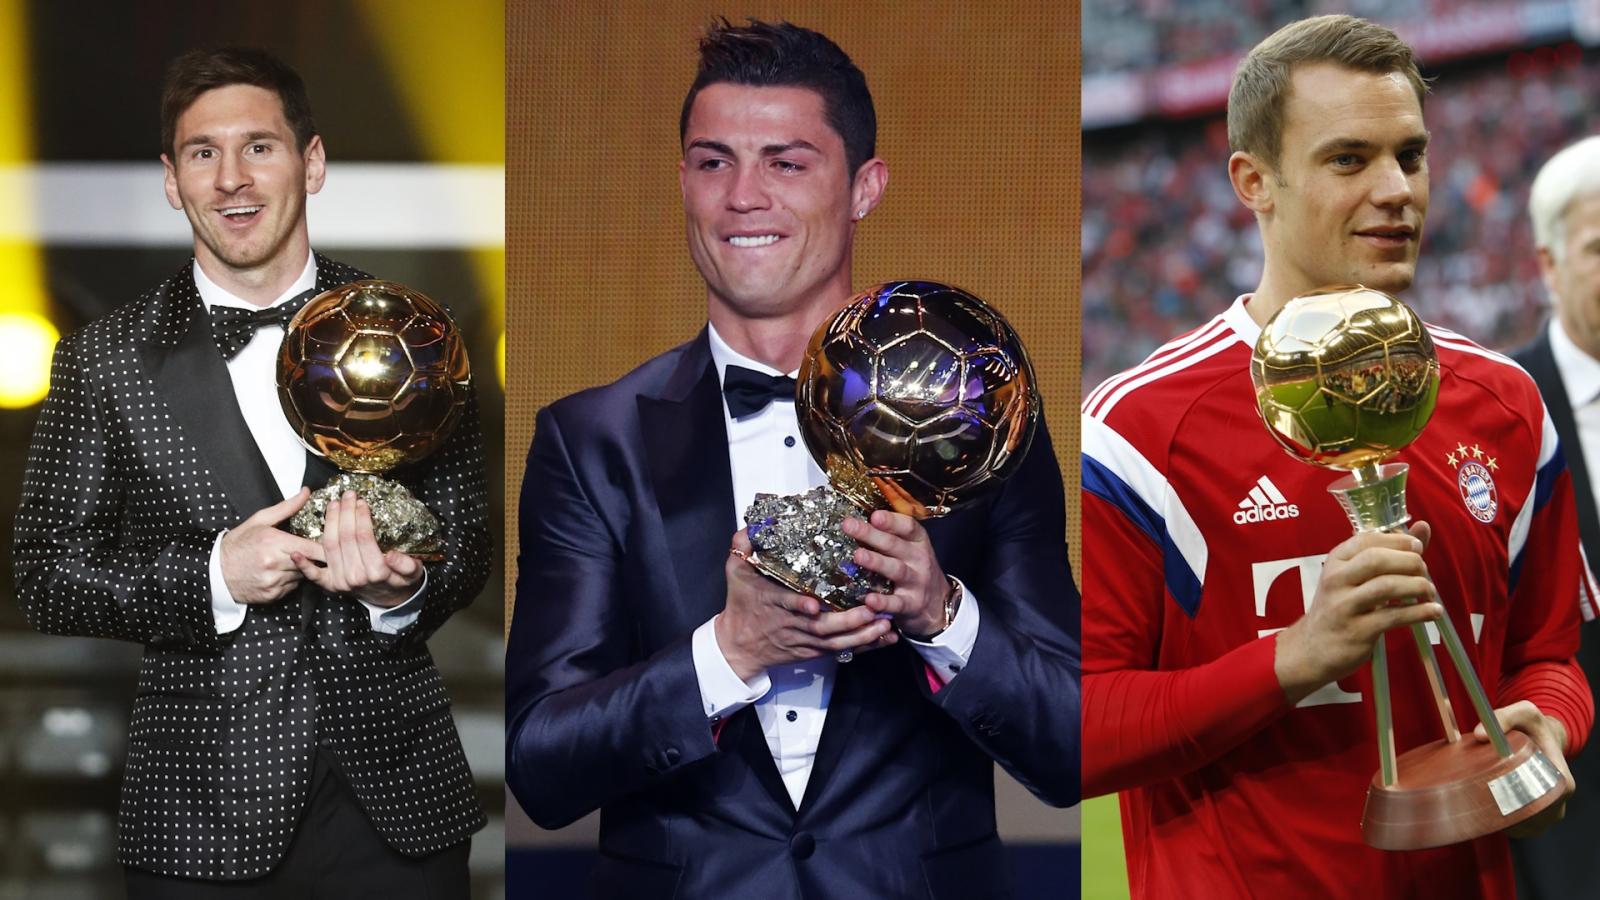 Sport Spotlight: Why Manuel Neuer should beat Cristiano Ronaldo to Ballon d'Or